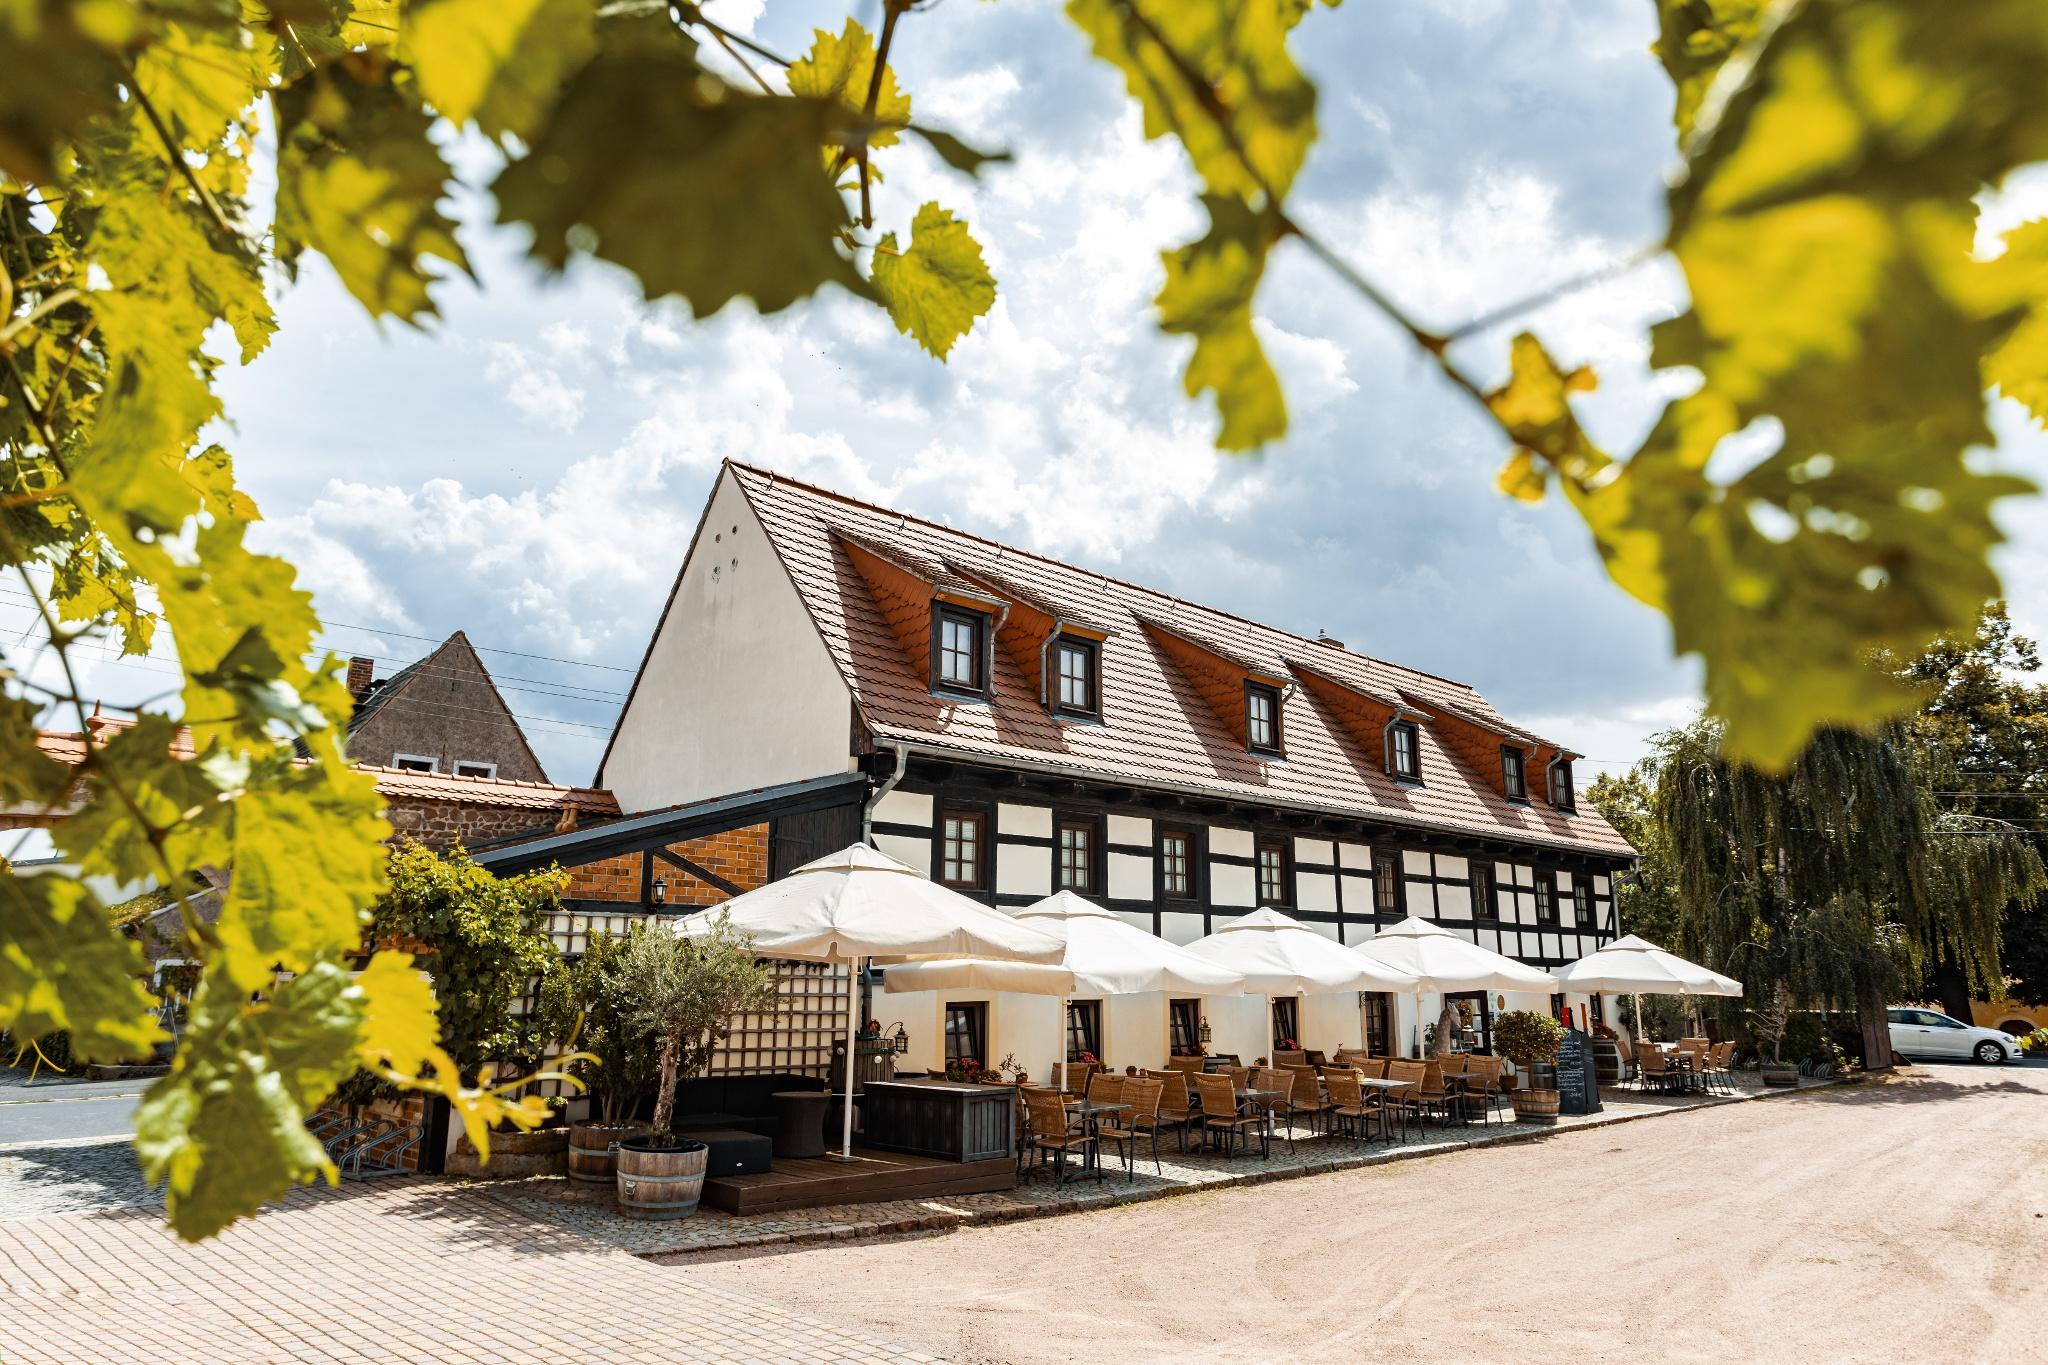 Weinrestaurant Pension Zur Bosel Outdooractive Com